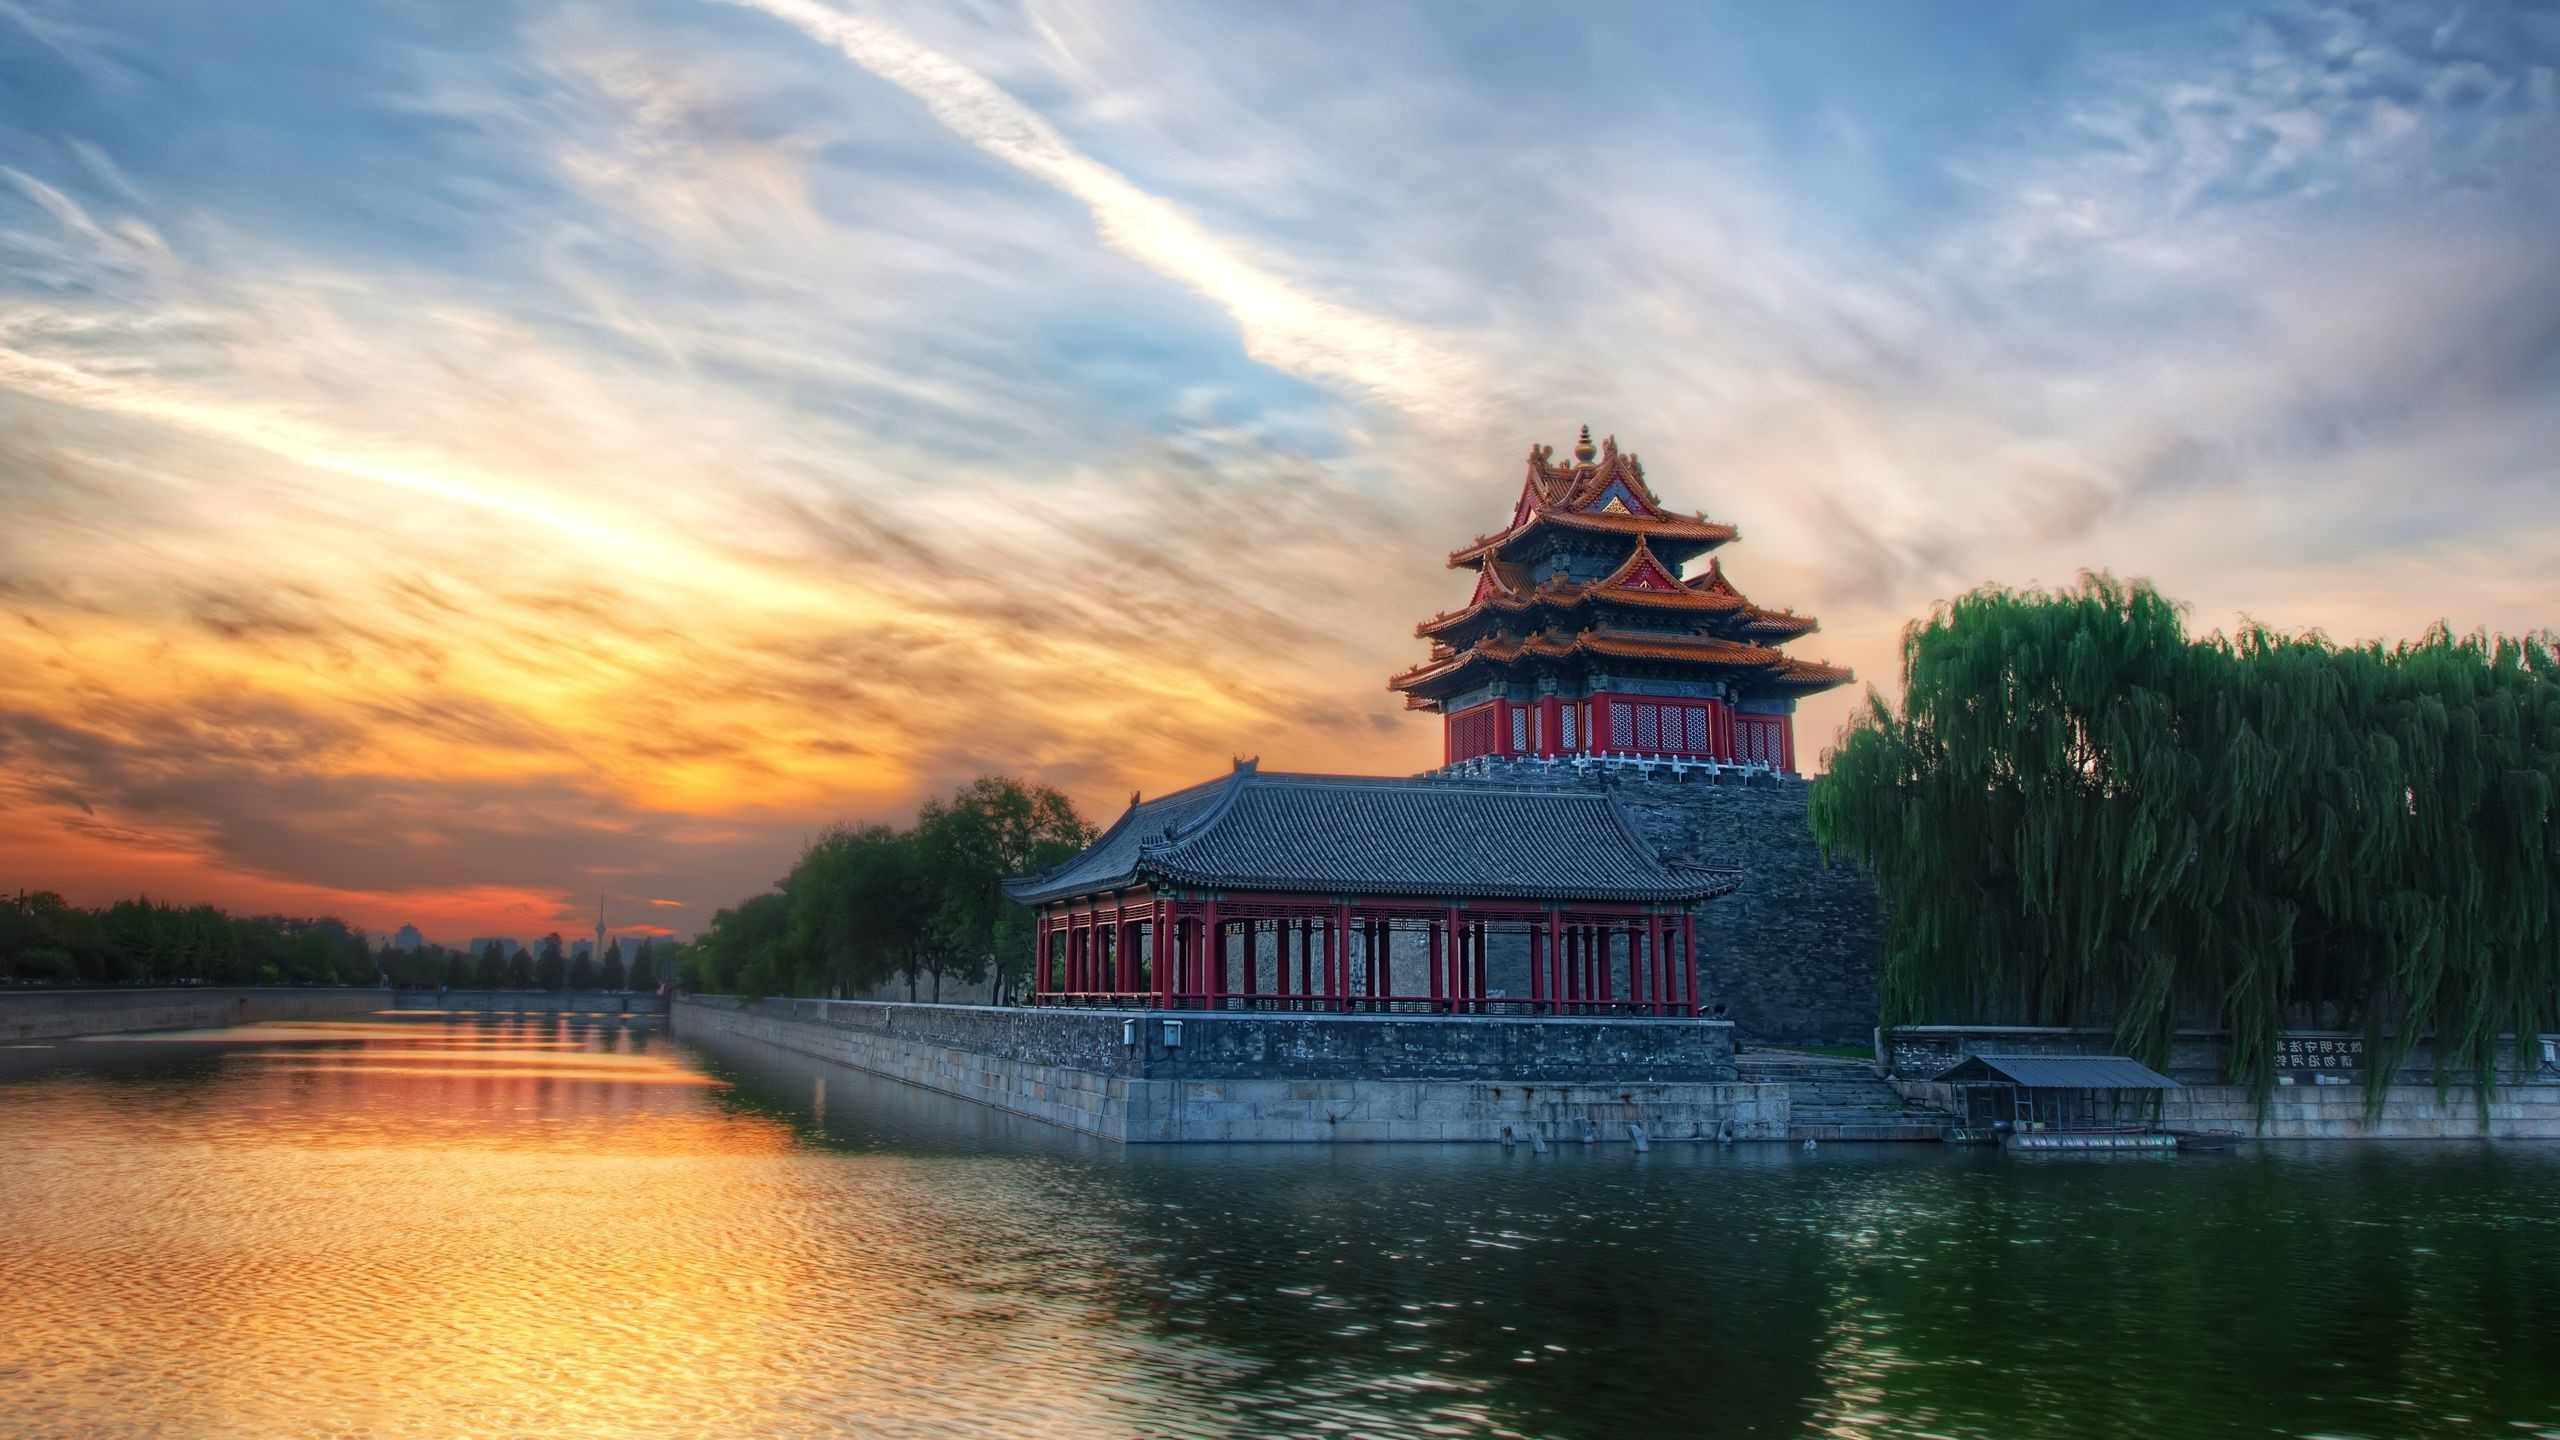 Res: 2560x1440, Forbidden City Landscape Wallpaper